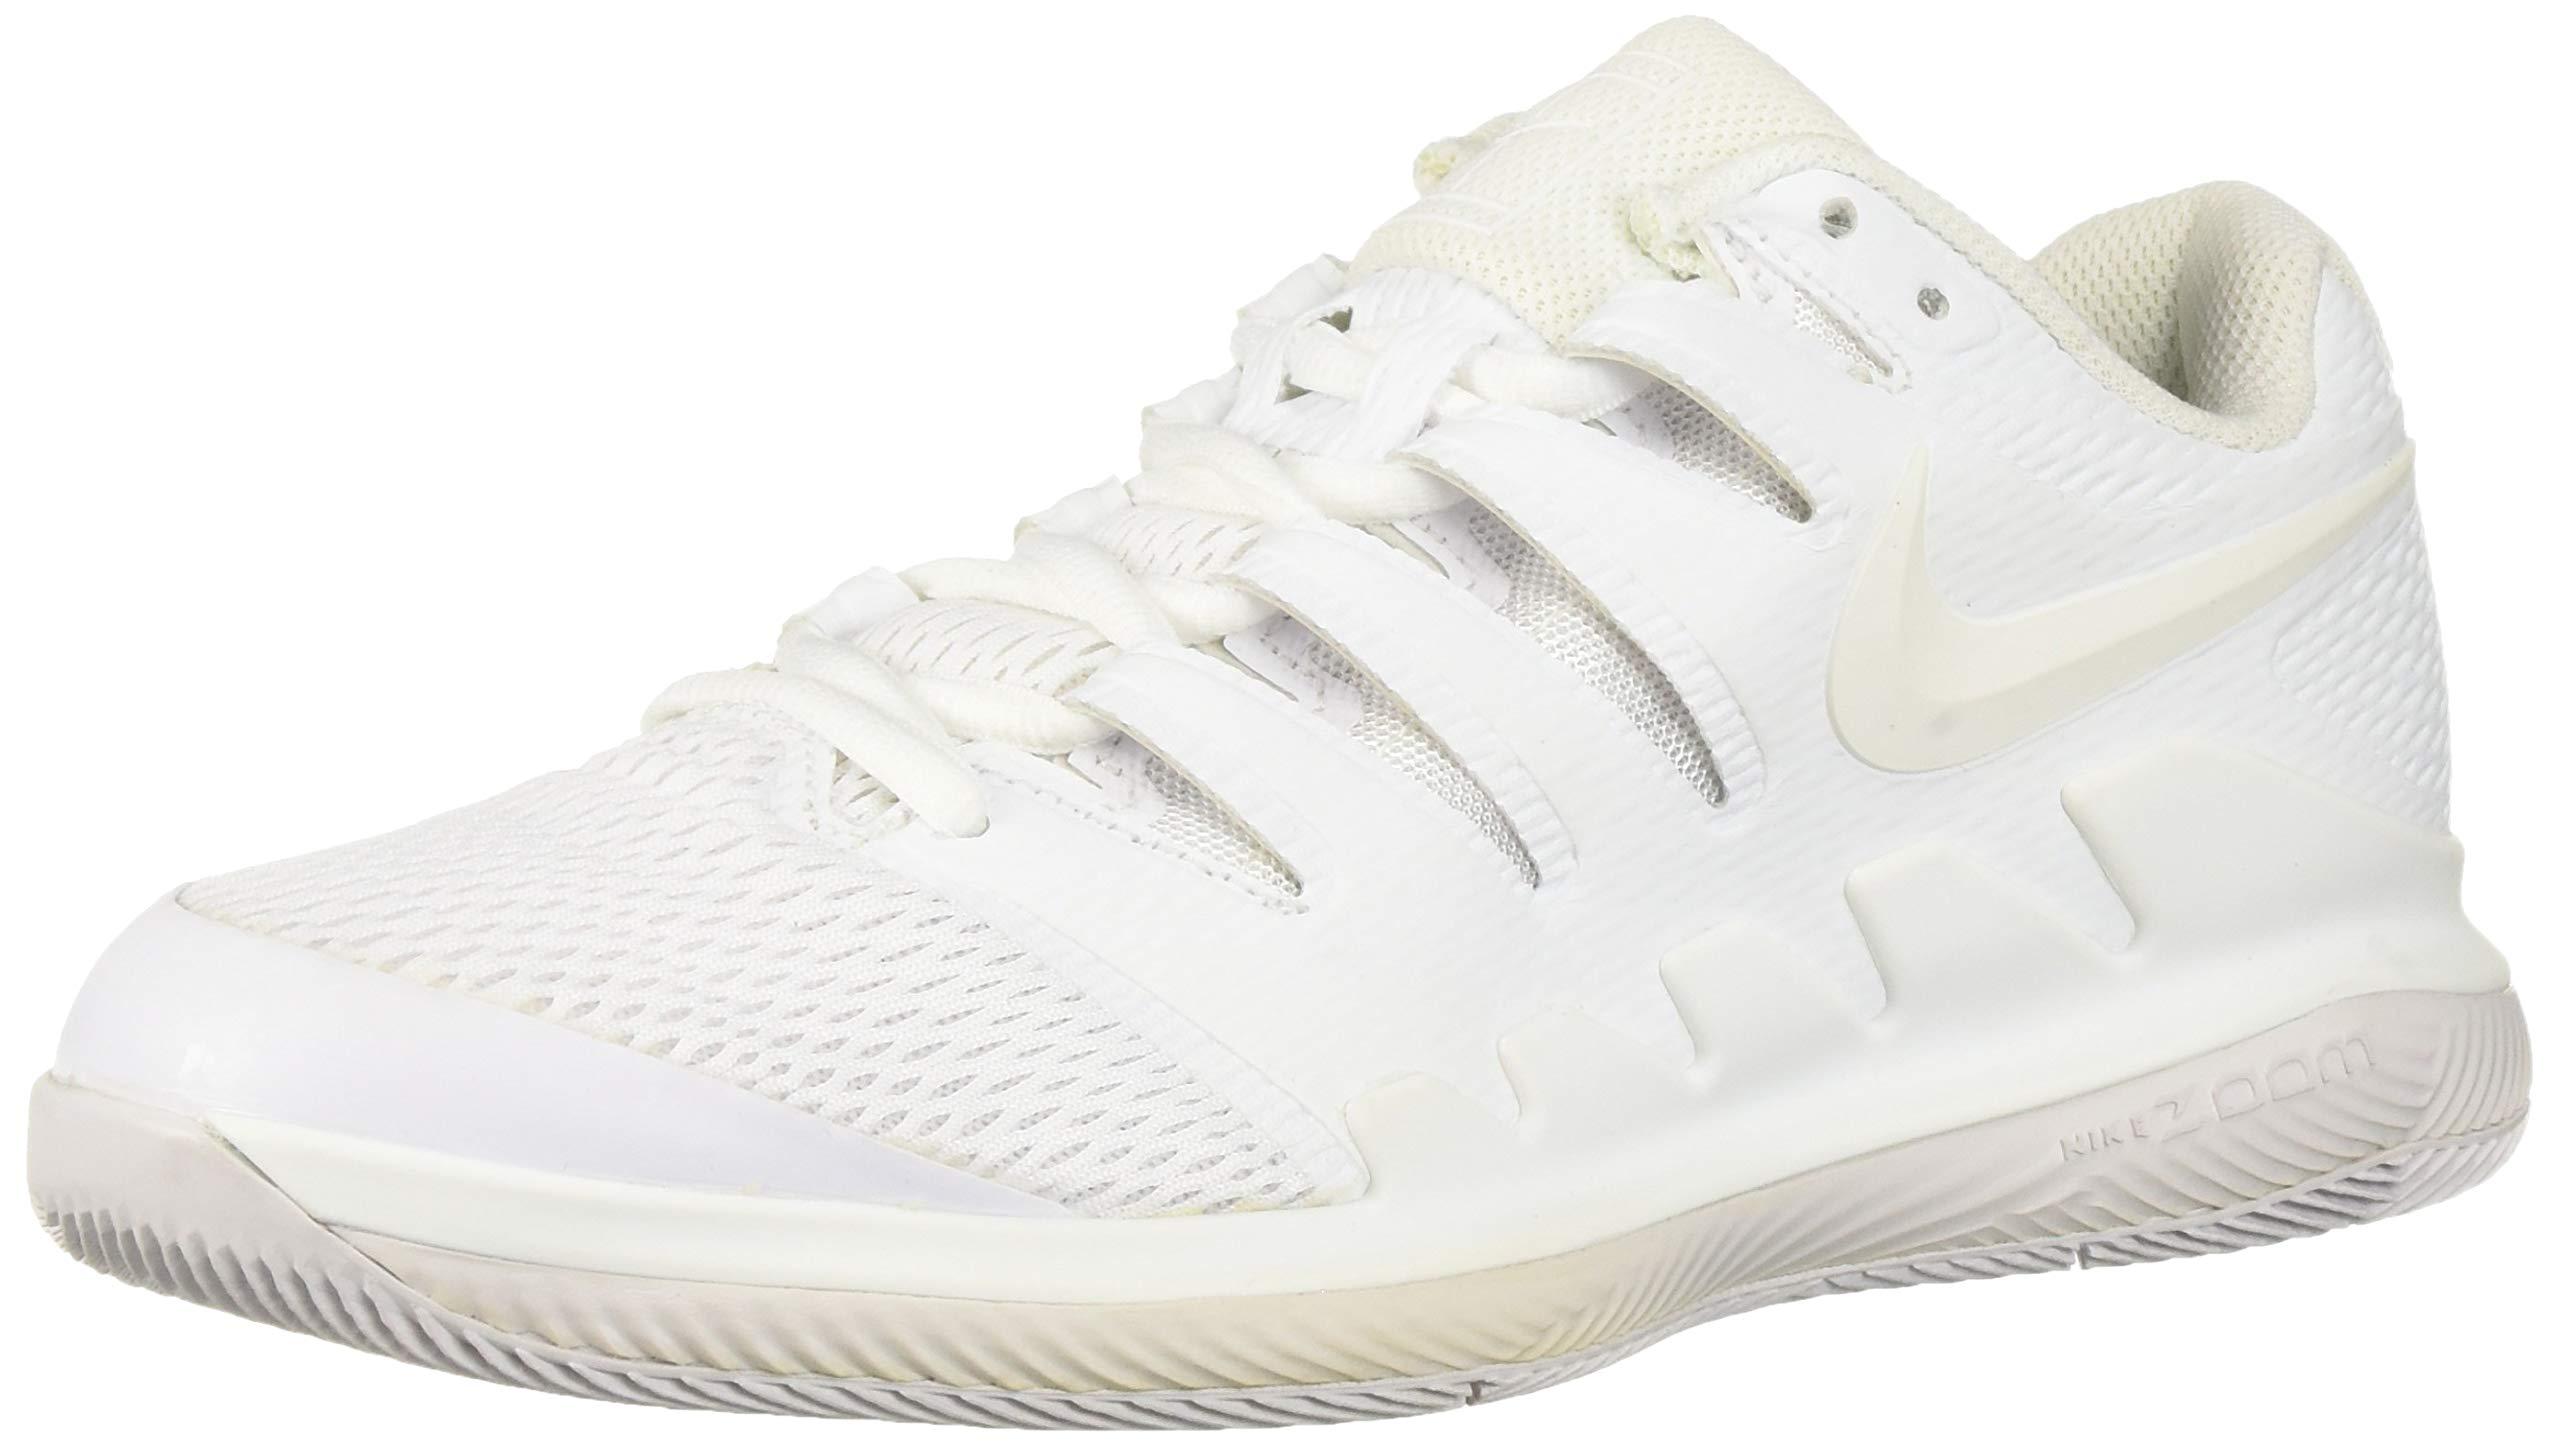 Nike Women's WMNS Air Zoom Vapor X Hc Trainers, Multicolour WhiteVast Grey 001, 6 UK